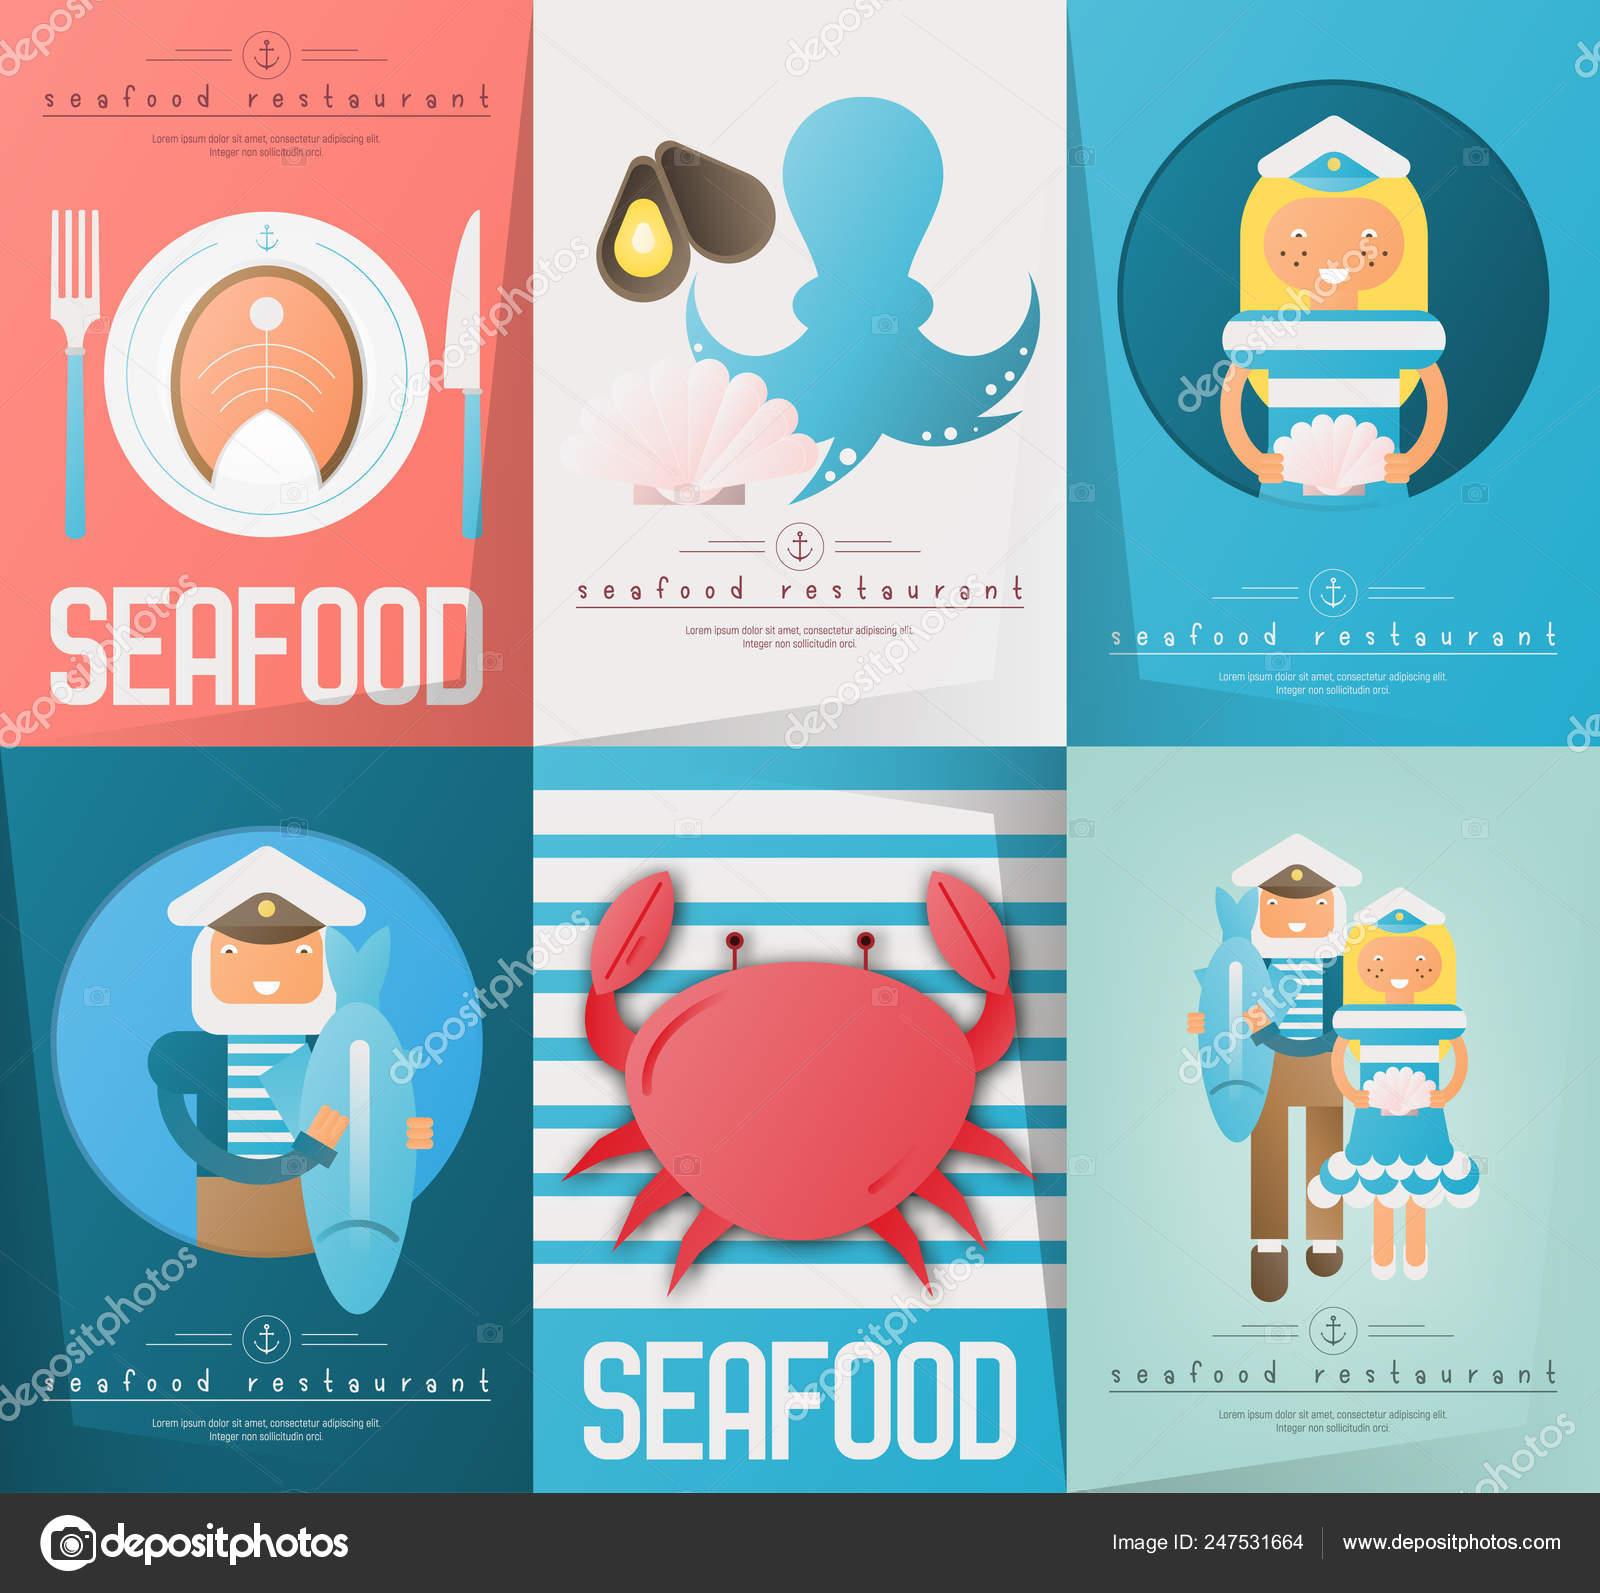 Seafood Restaurant Posters Set Stock Vector C Elfivetrov 247531664